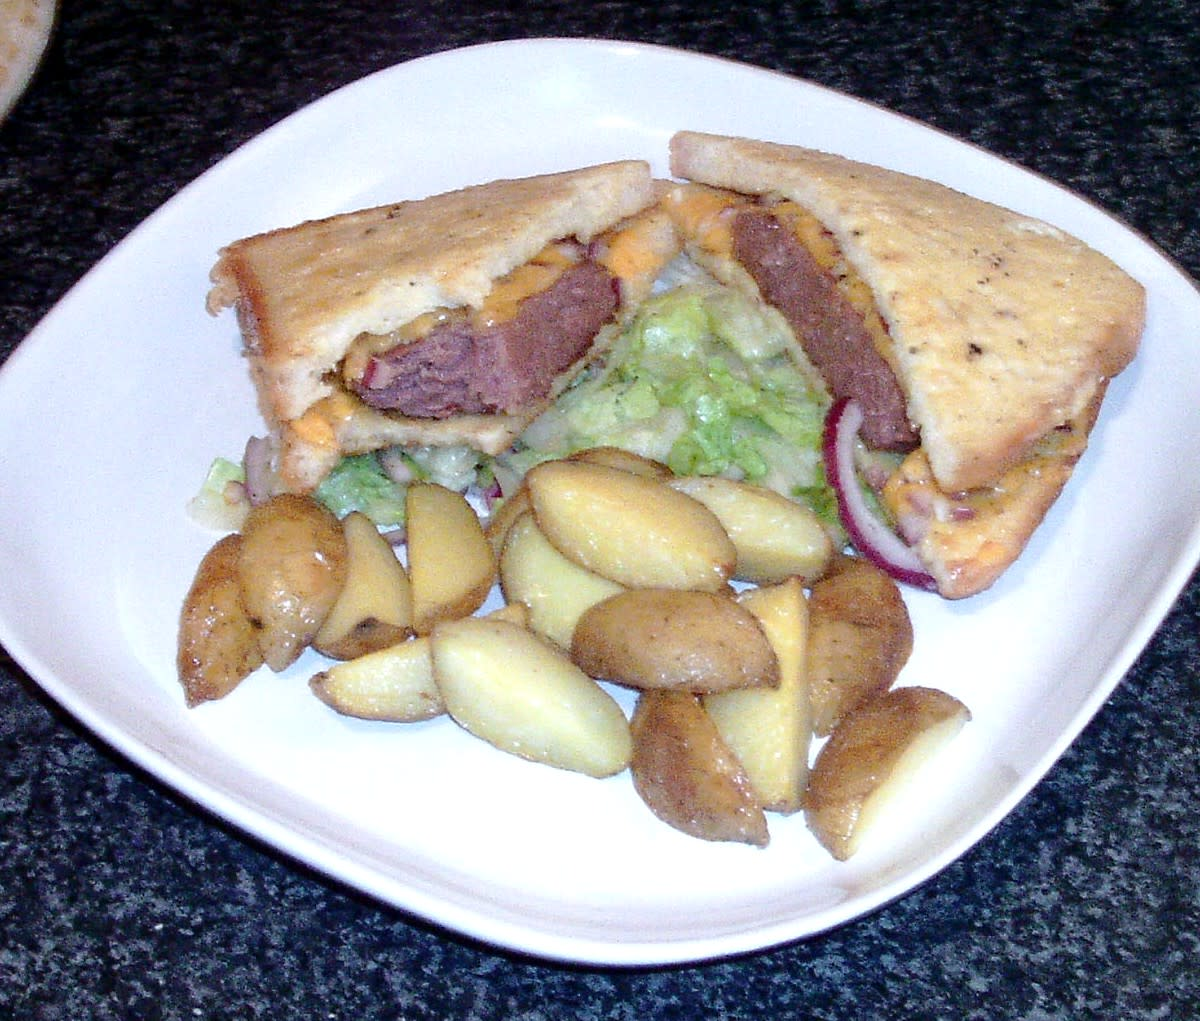 Enjoying cheesy Belgian blue beef burger and eggy bread sandwich